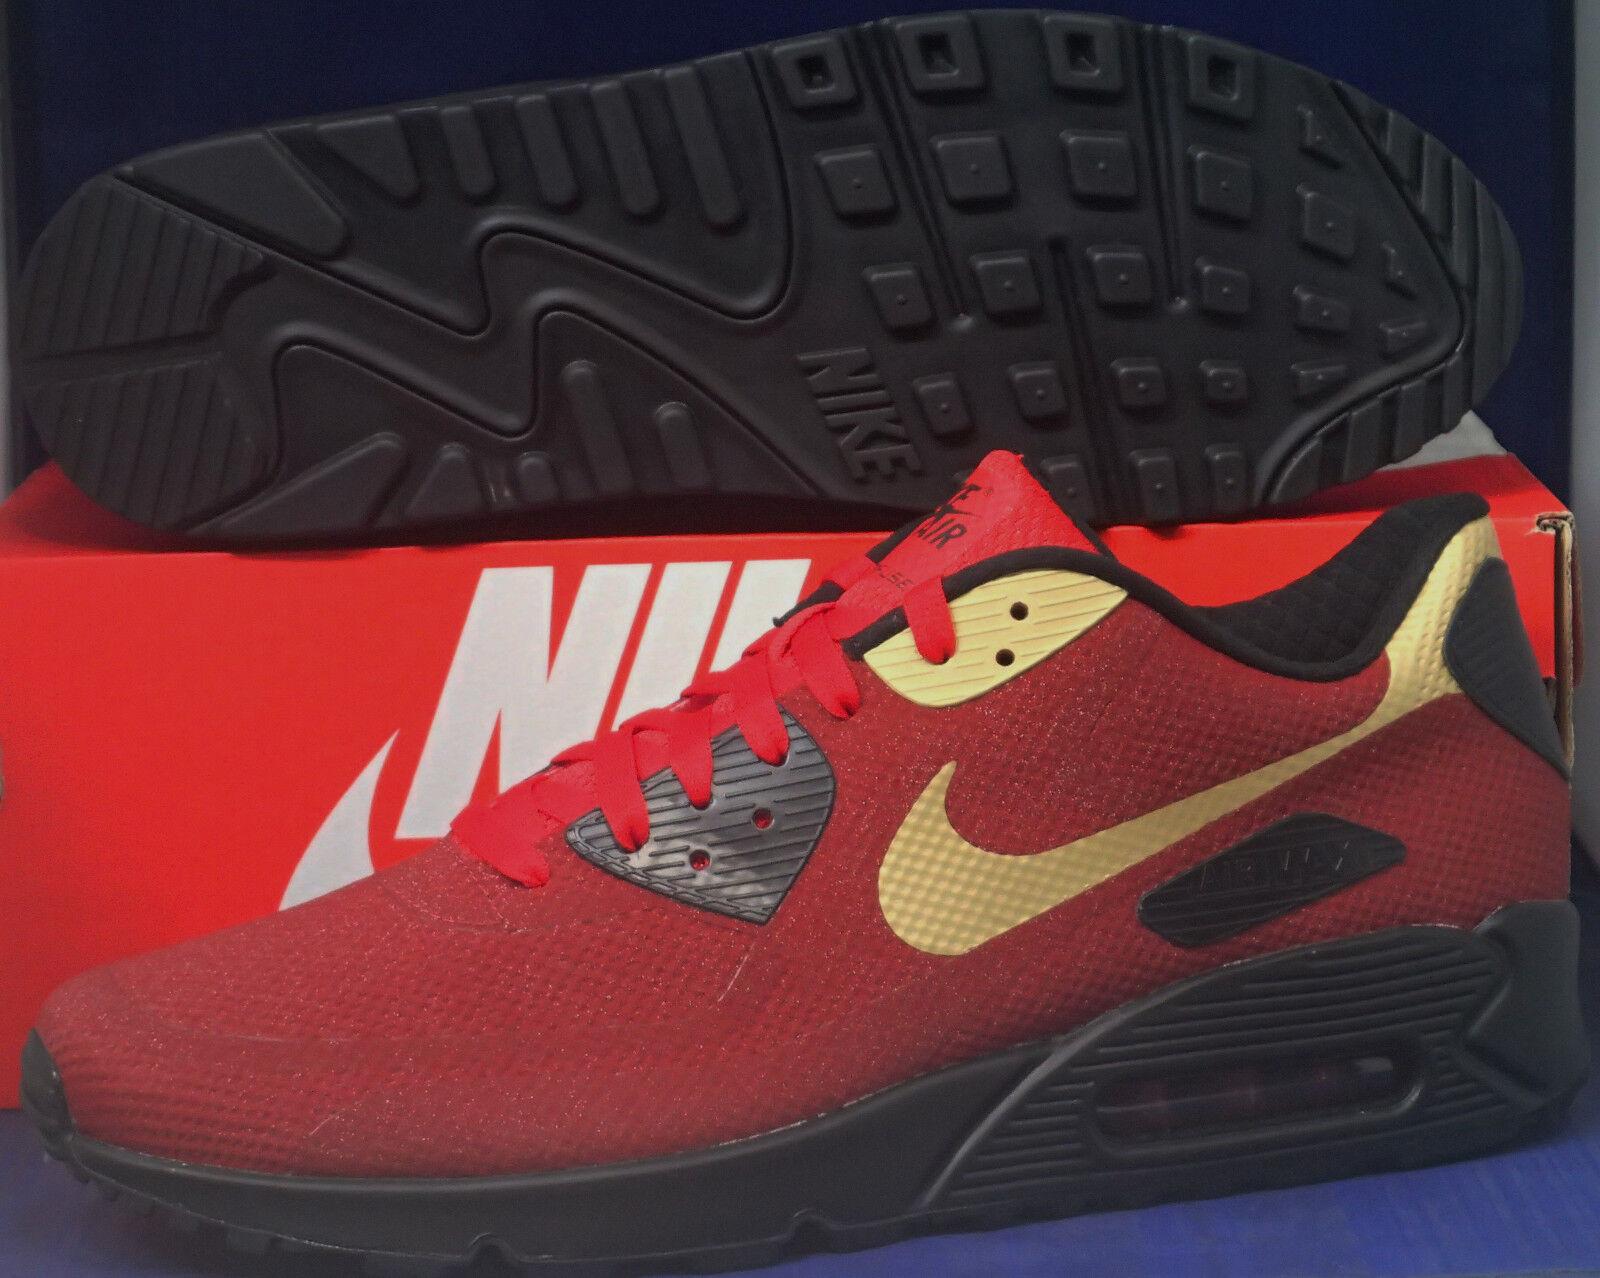 Nike Air Max 90 Hyperfuse Premium Gala Glimmer iD Team Red SZ 12.5 (822560-997)